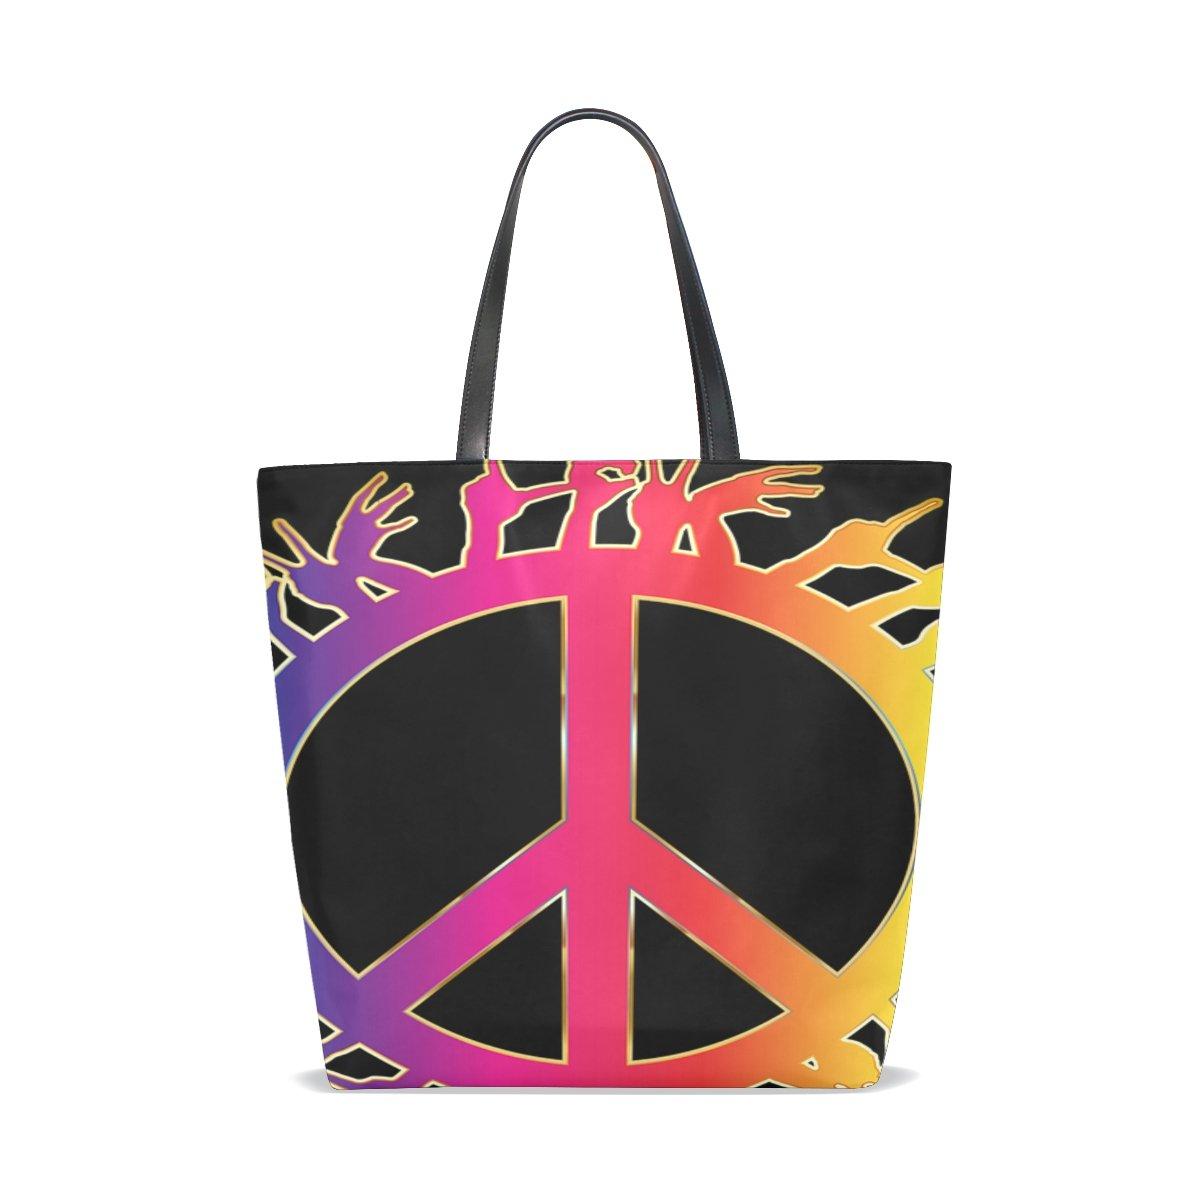 f6e2d30bfd Amazon.com  Dnoving Women Love Hands Emotion Feeling Sign English Alphabet Handle  Satchel Handbags Shoulder Bag Tote Purse Messenger Bags  Shoes